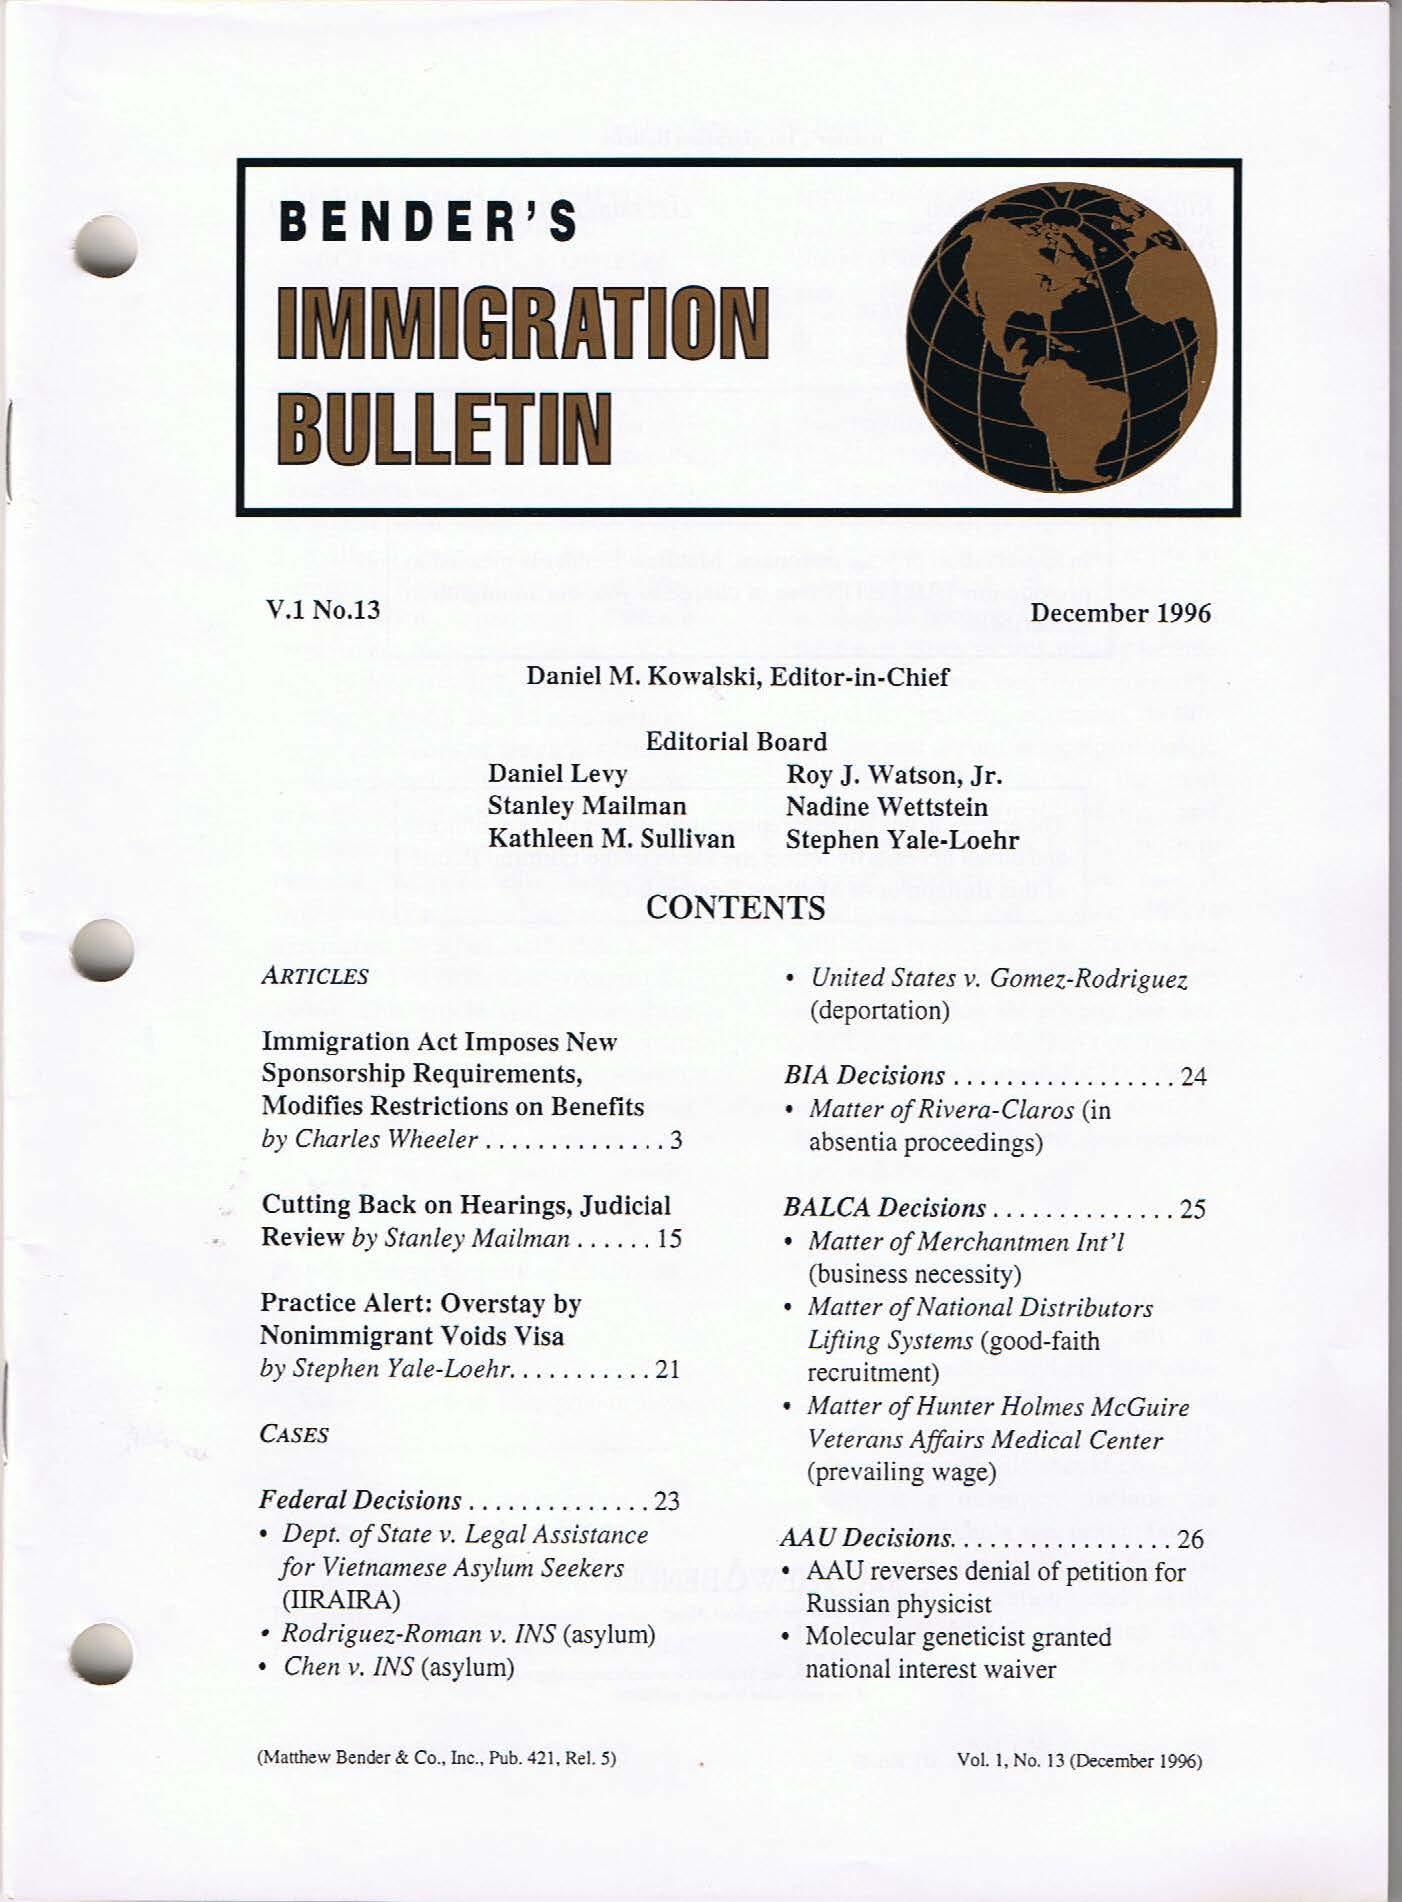 Bender's Immigration Bulletin